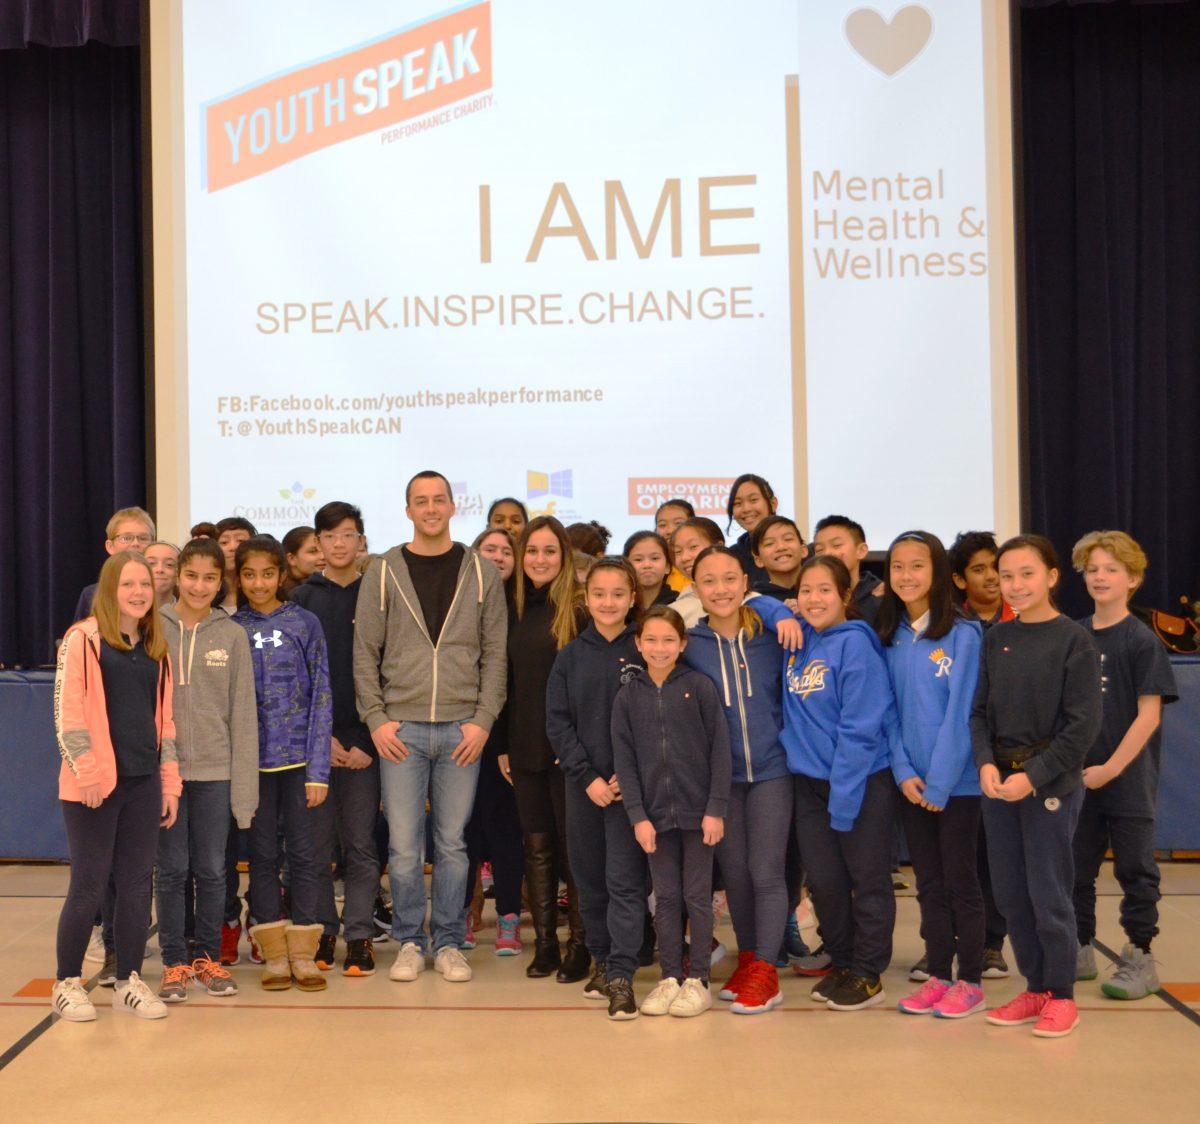 Youth Speak Presentation on Mental Health